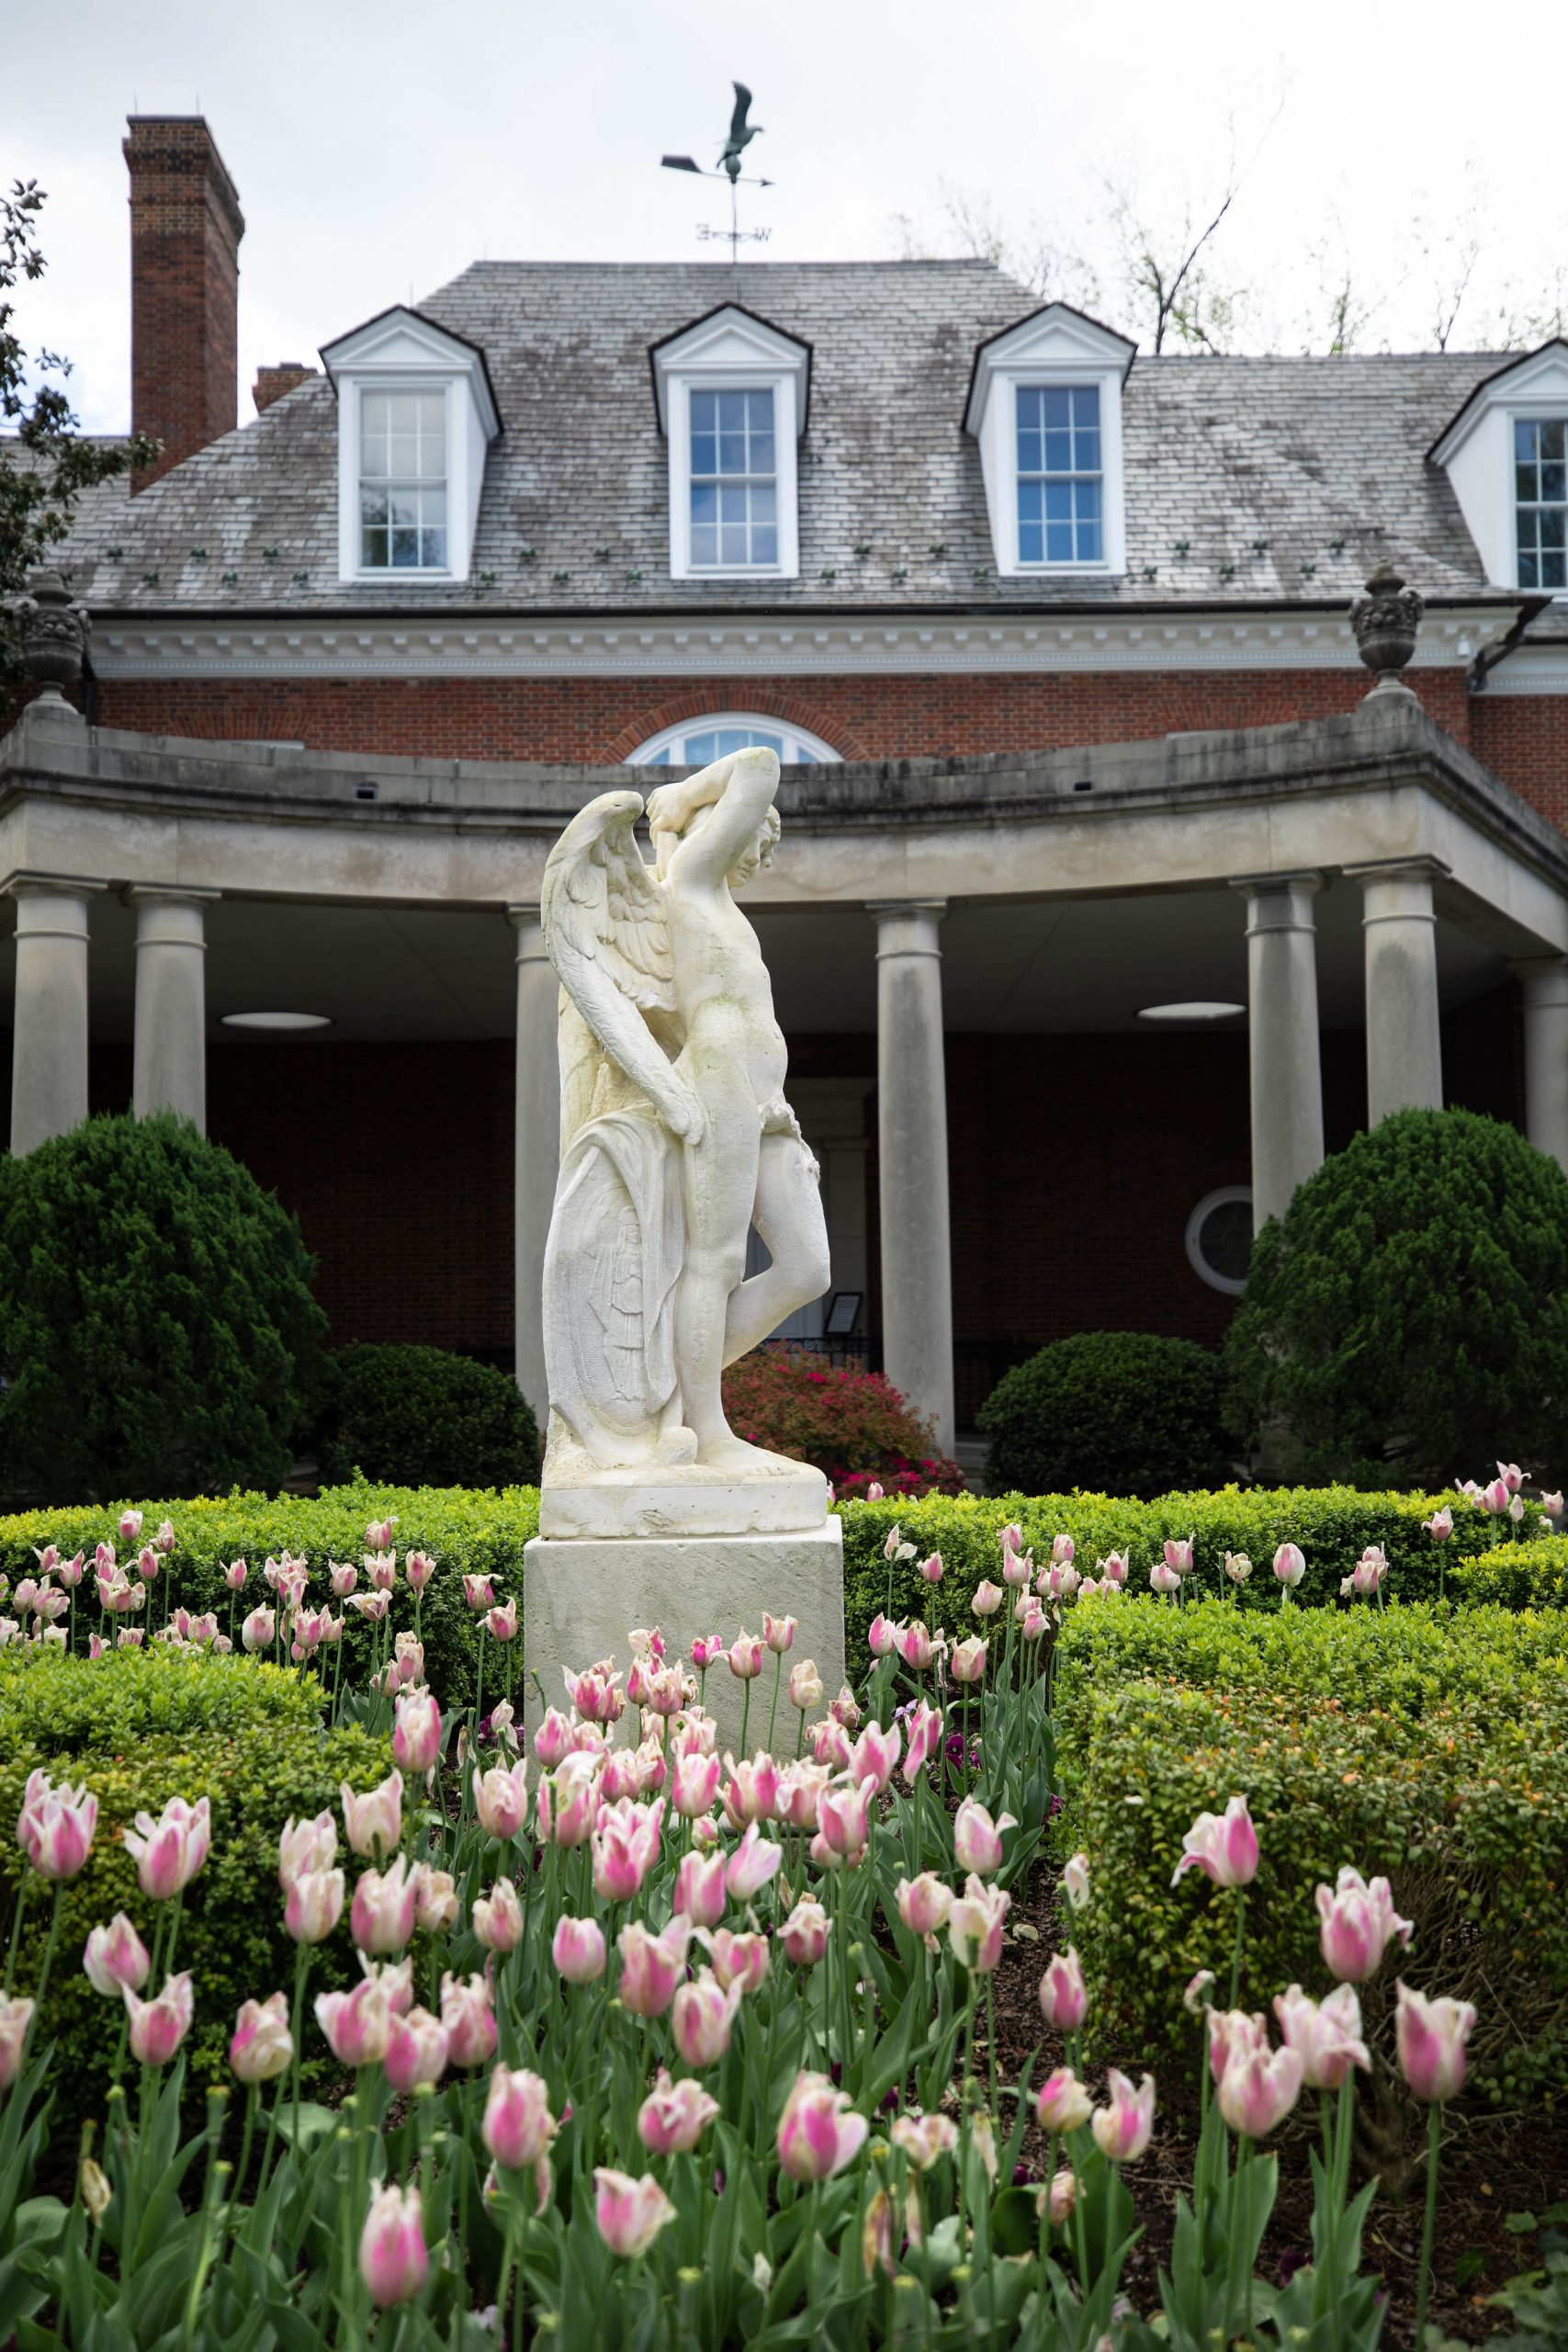 Hillwood Estate, Museum & Gardens in Washington, D.C. by Luxury Travel Writer and Photographer Annie Fairfax